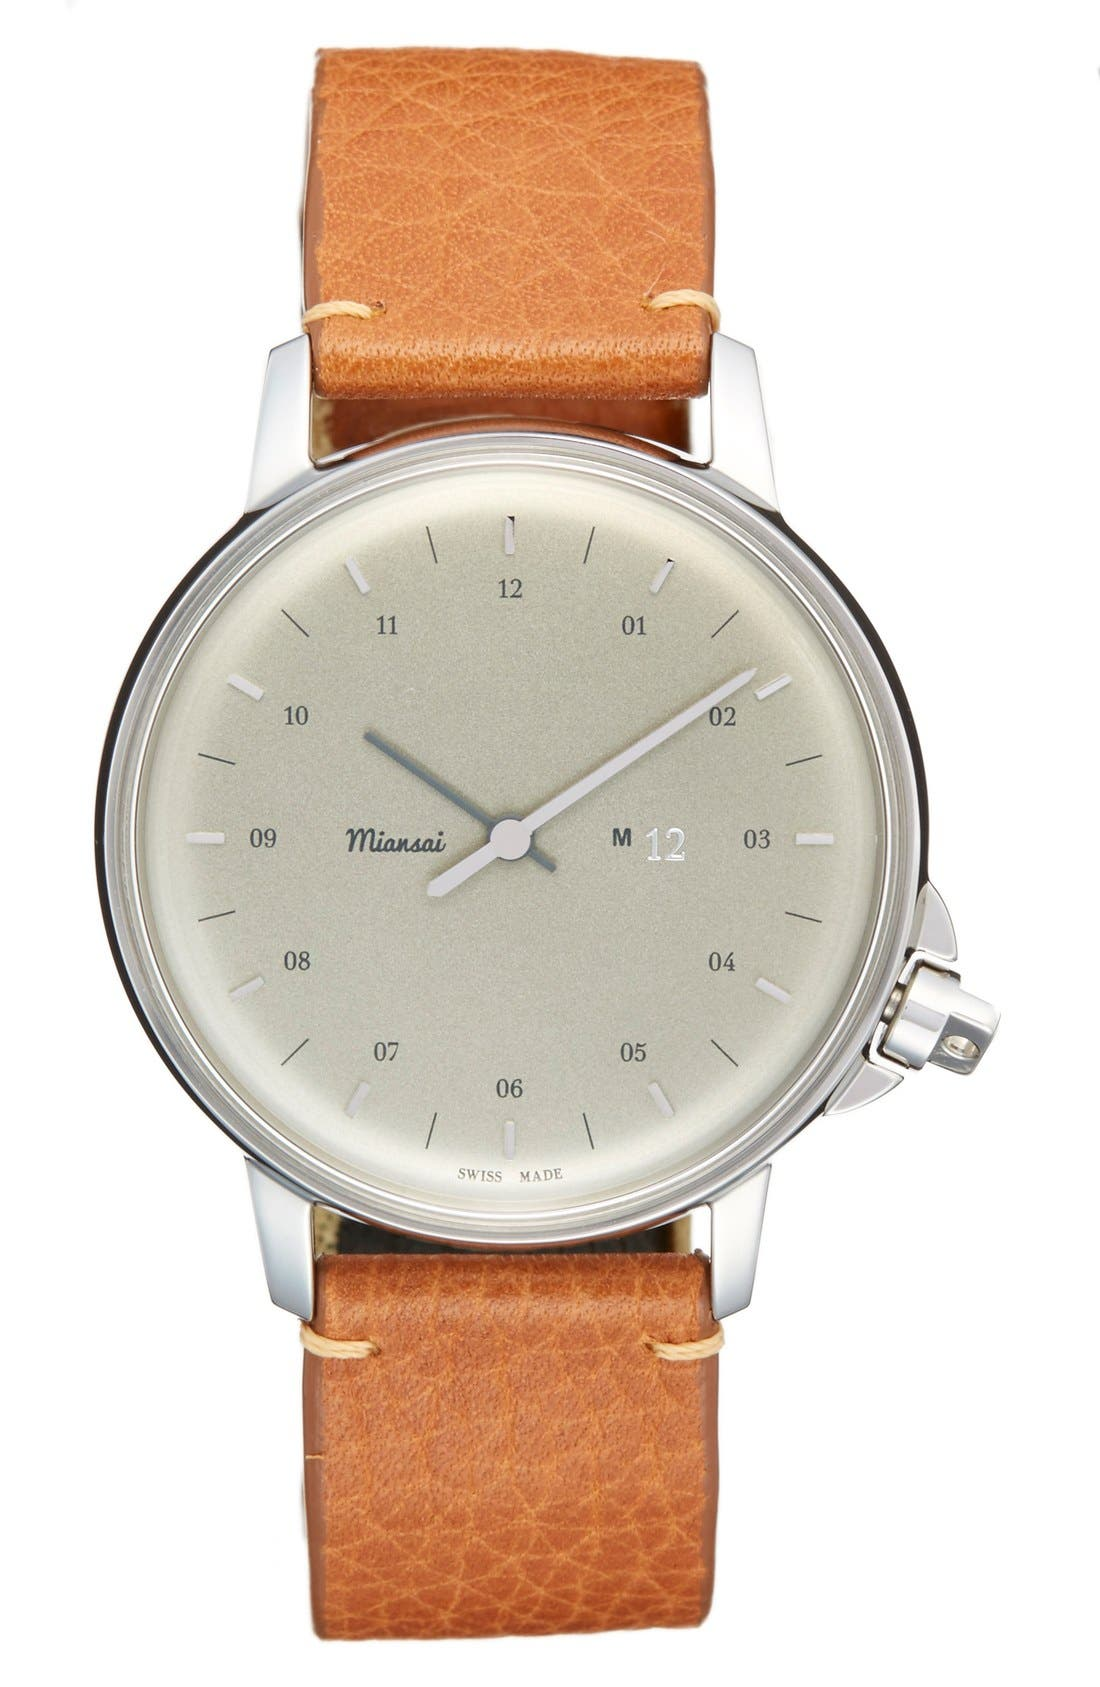 MIANSAI 'M12' Leather Strap Watch, 39mm